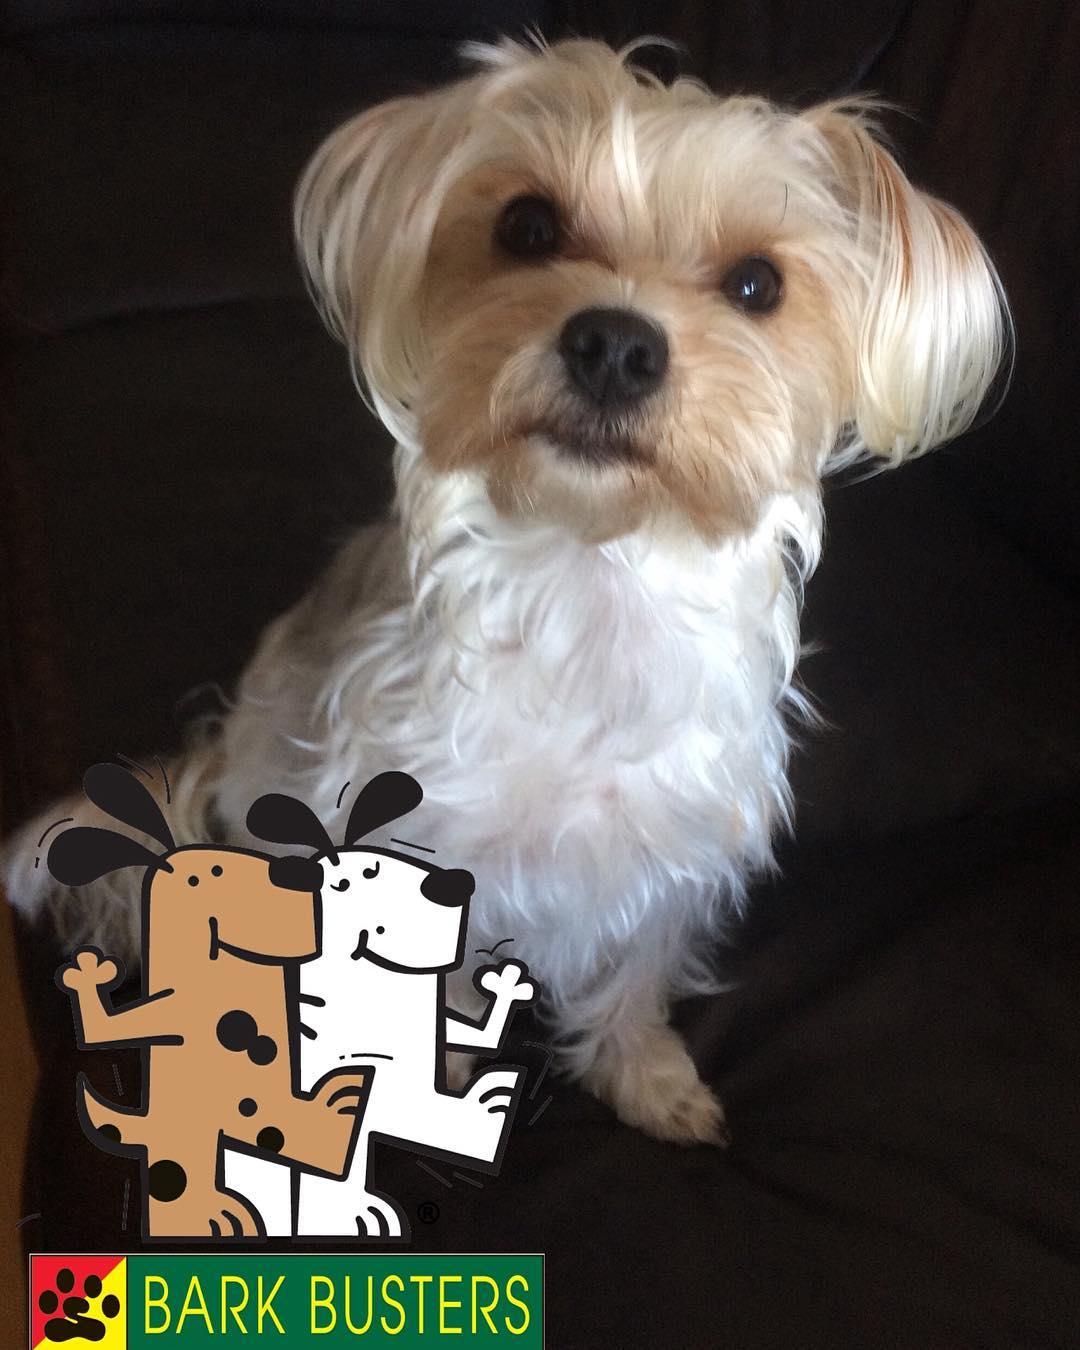 #BarkBusters #dogtraining #dogtrainerNorthernNewJersey #speakdog #dogs #puppies #HappyDogsHappyFamilies #Morkie #Maltese #Yorkshire Terrier #Yorkie #dogsOfBarkBusters #FortLee